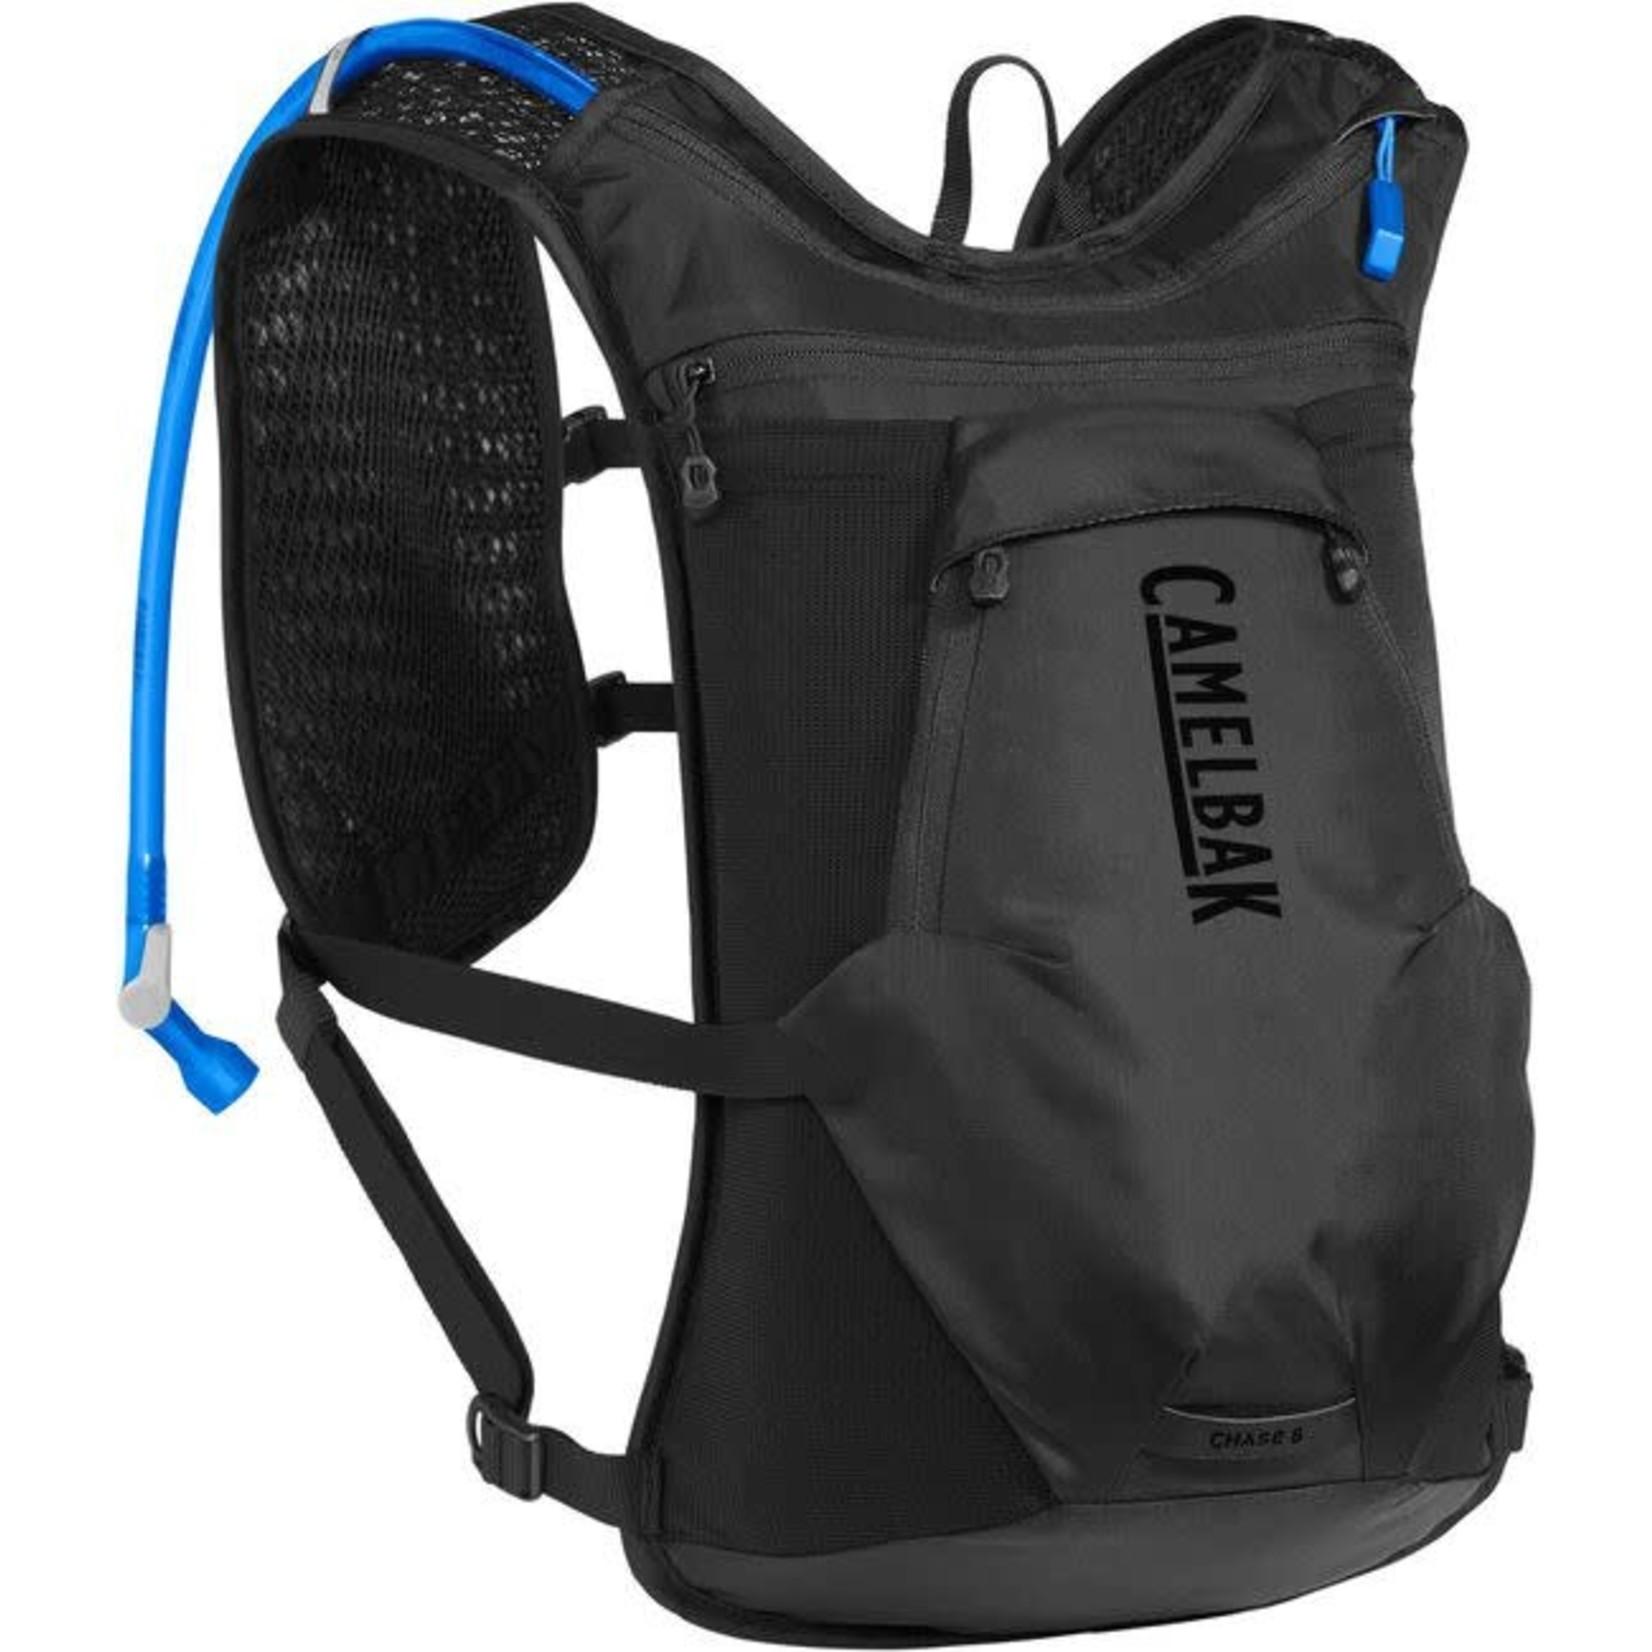 CAMELBAK CamelBak, Chase Bike Vest, 50oz, Black